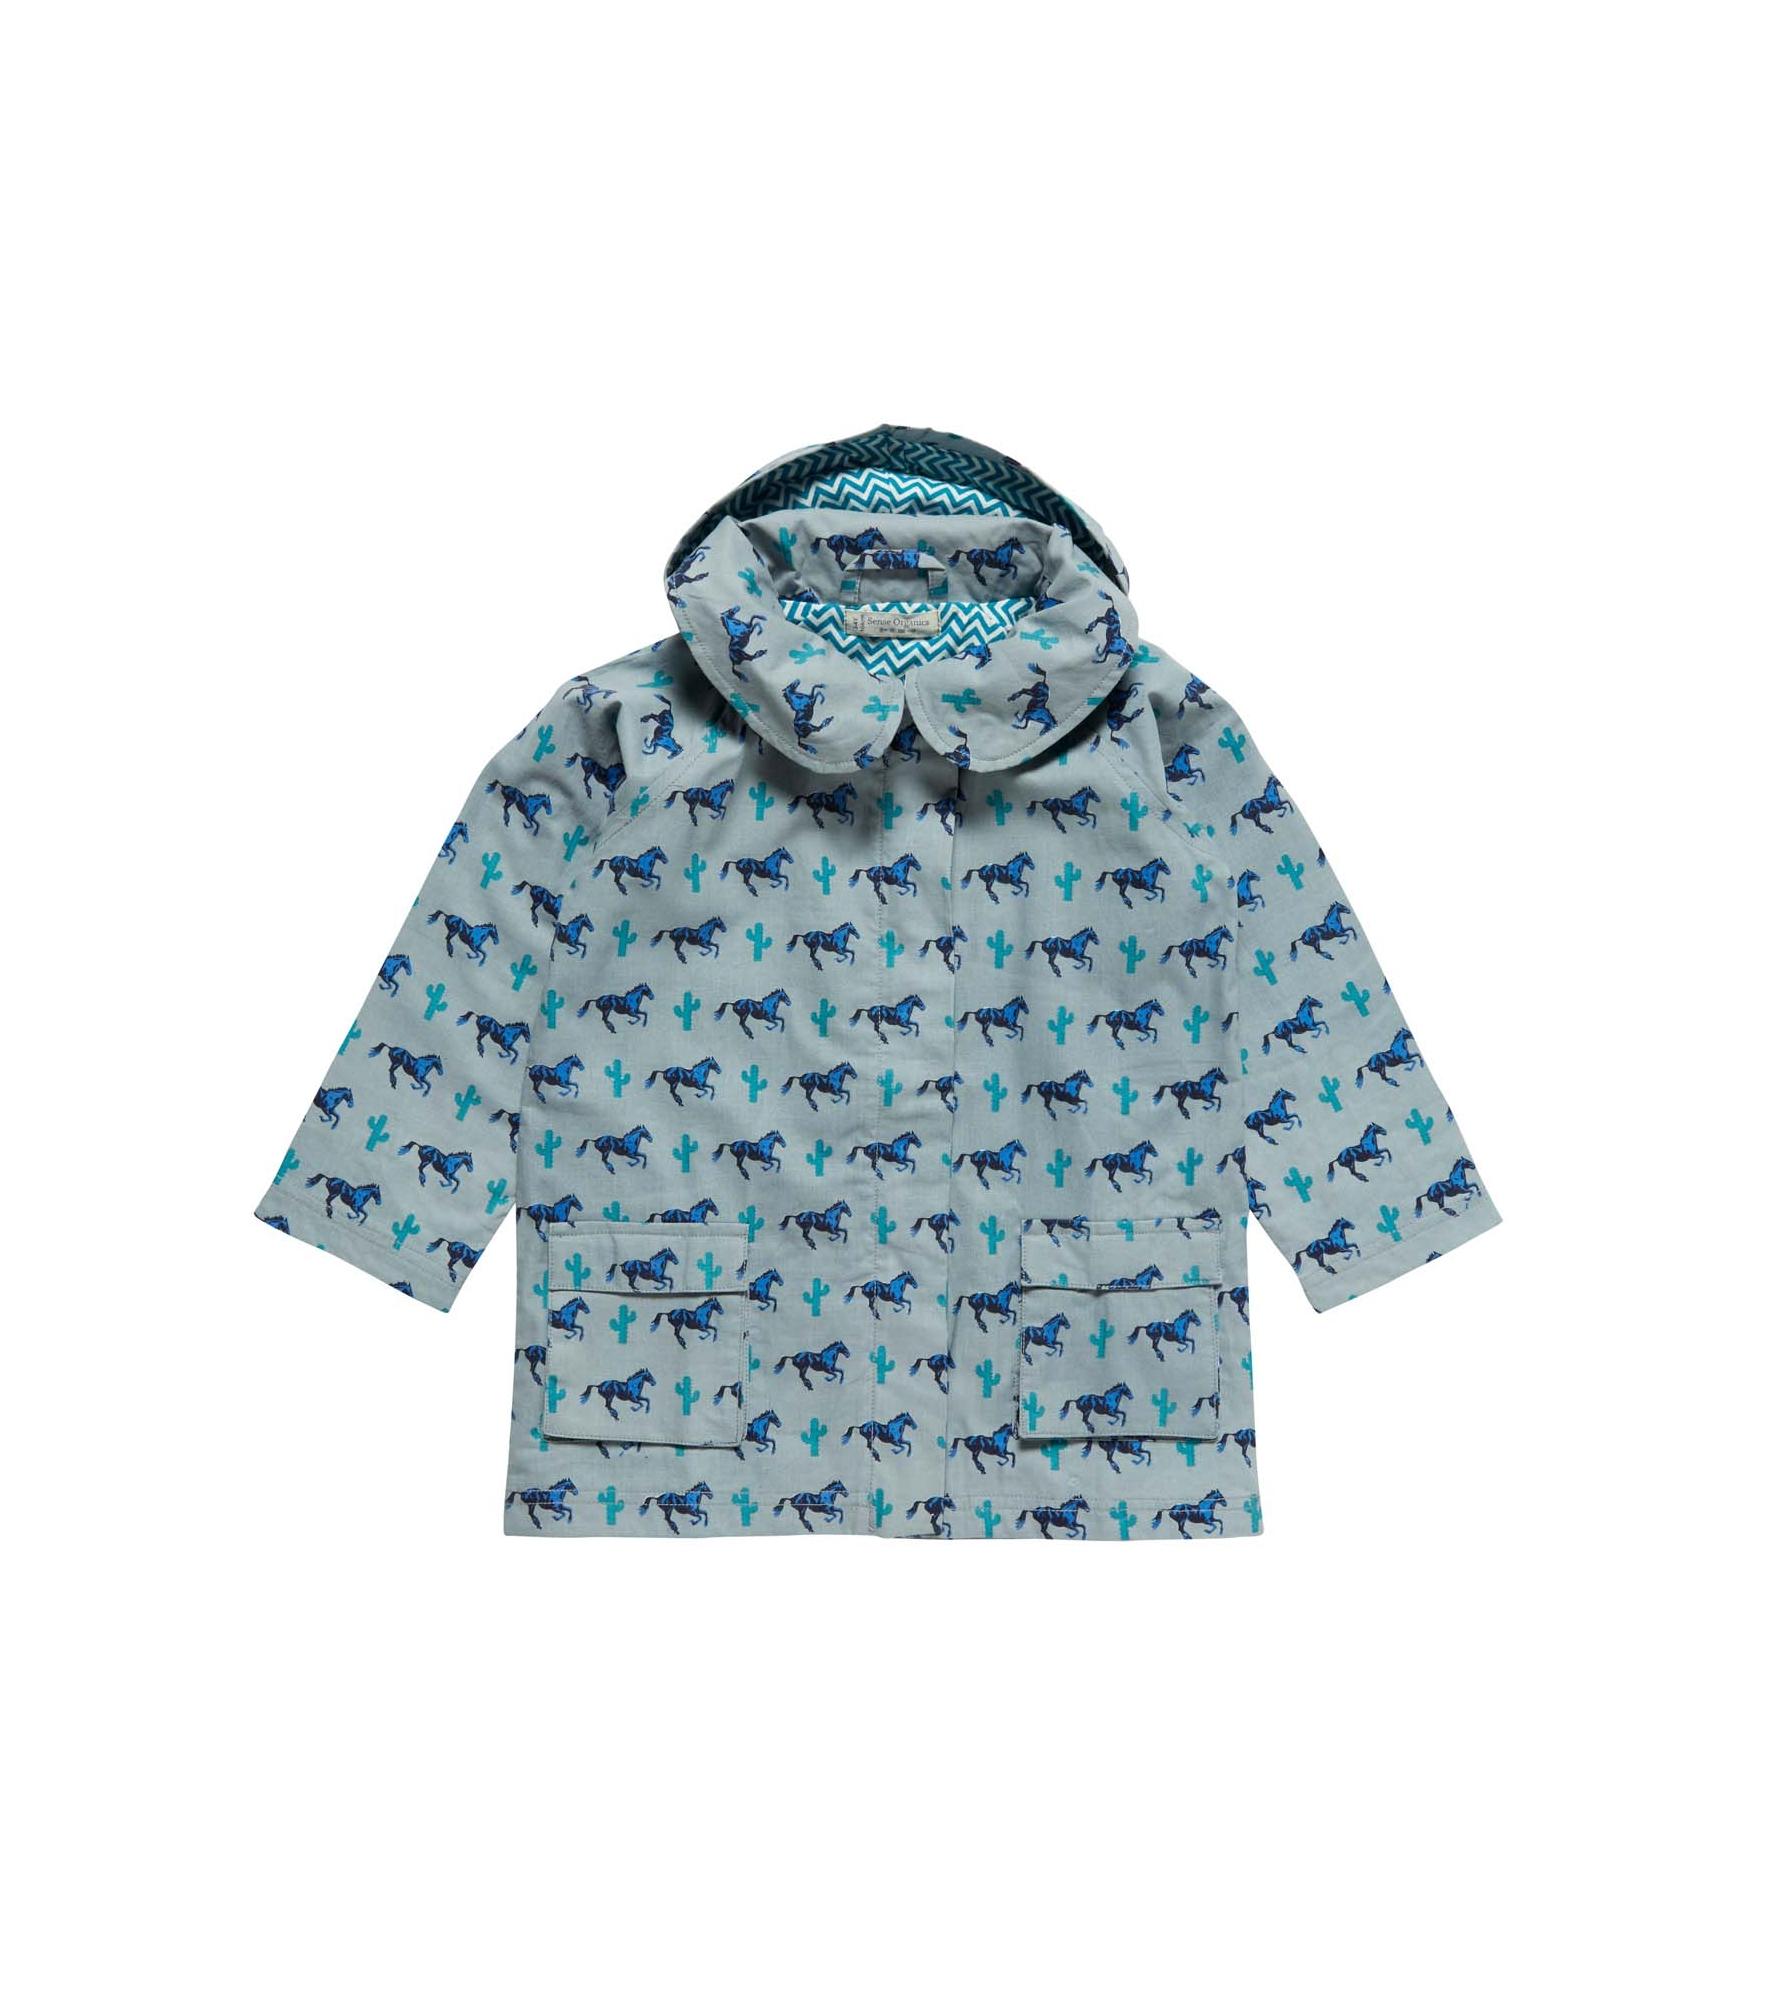 1711547-sense-organics-Lou-jacket-horse-print.jpg